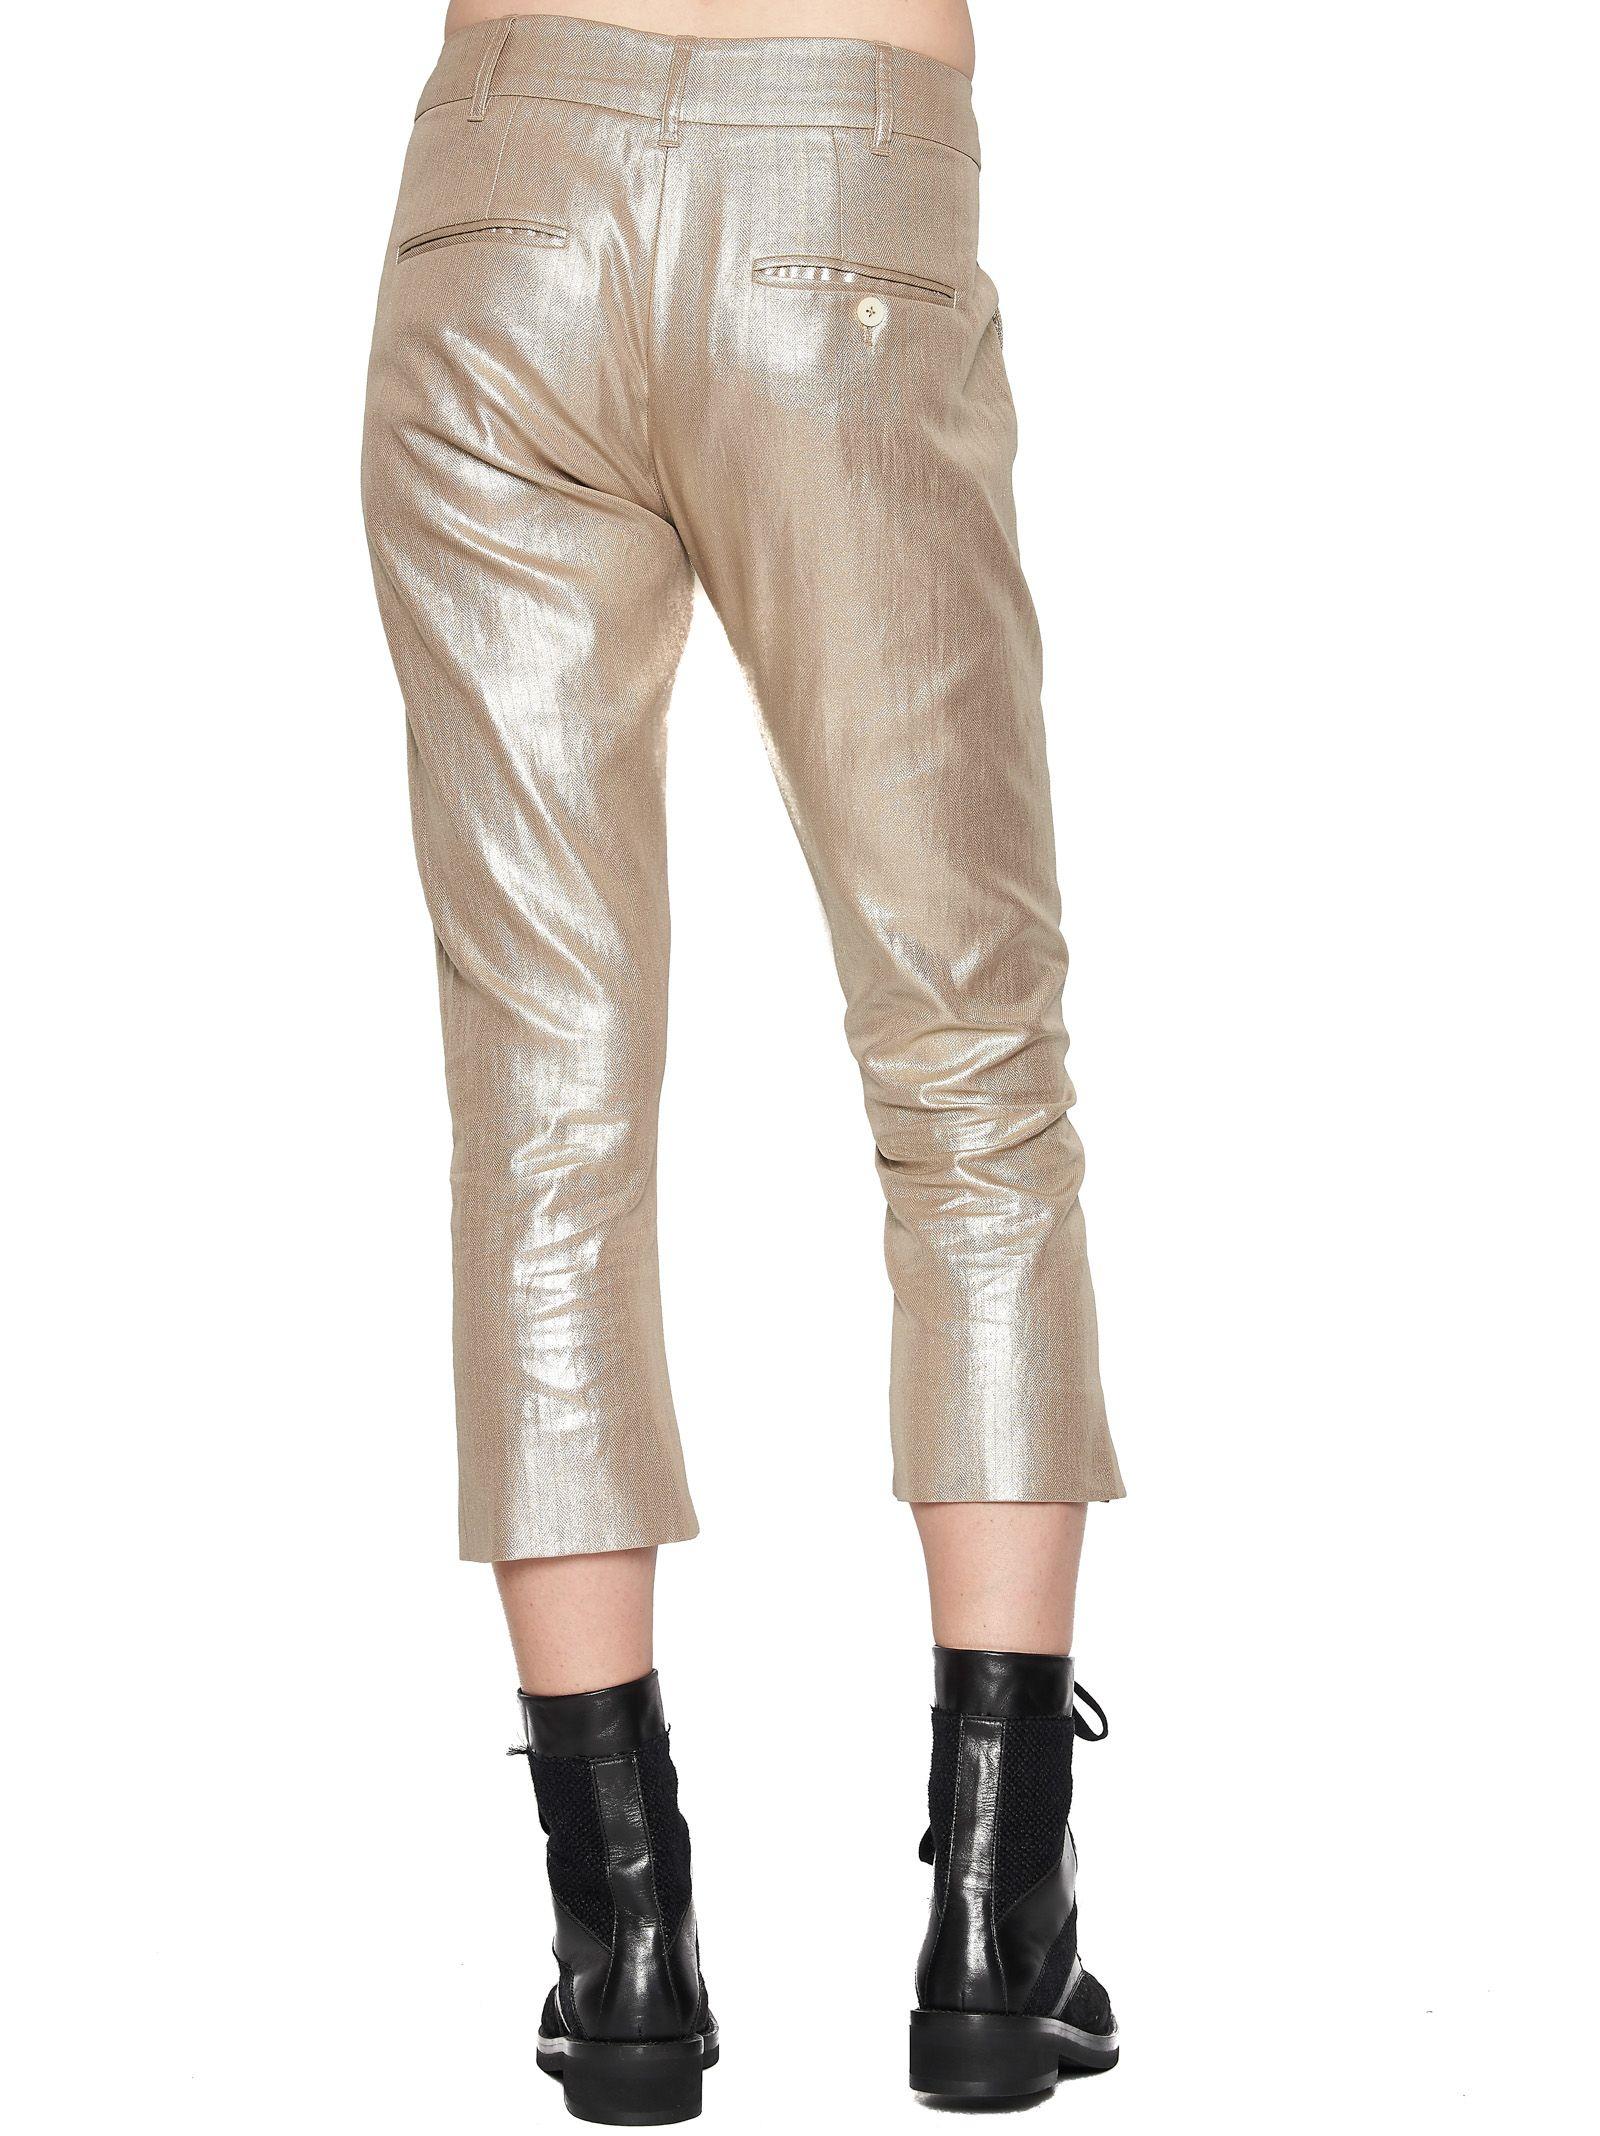 Best Wholesale Cheap Price Looking For Sale Online lurex pants Ann Demeulemeester The Cheapest For Sale Wholesale RQZn5Estde